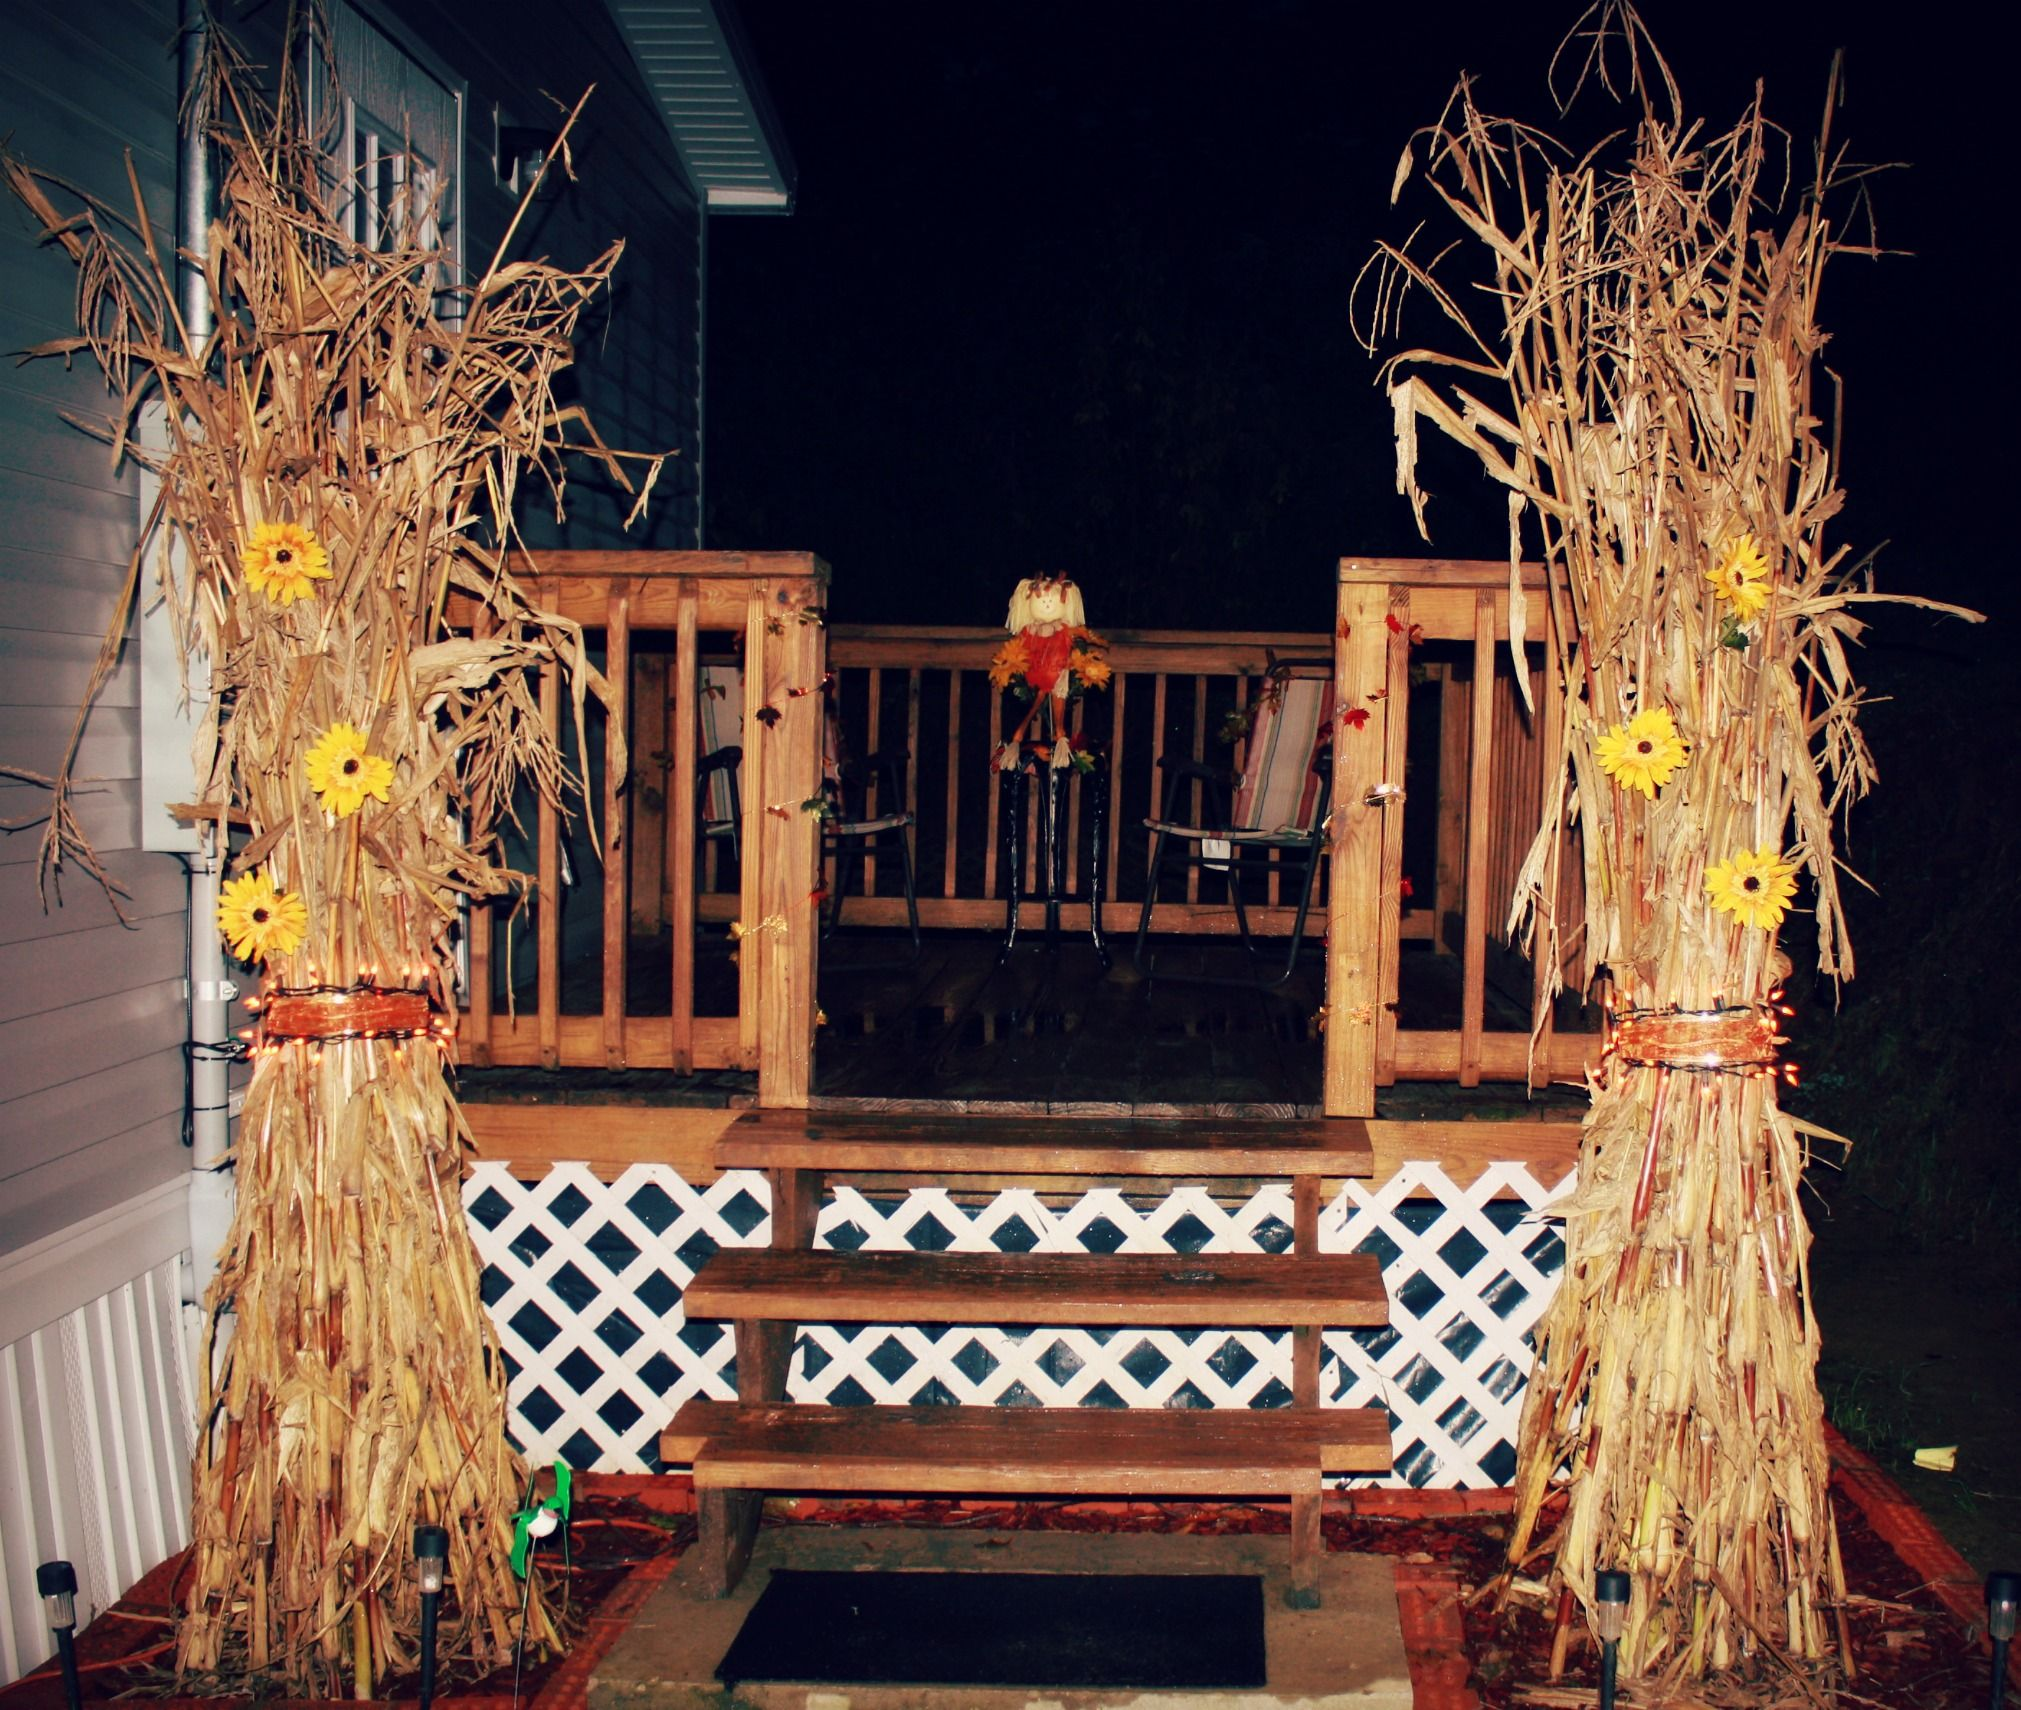 Corn Stalk Decoration Ideas: Outside Fall Decor, Corn Stalks, Fodder Shock